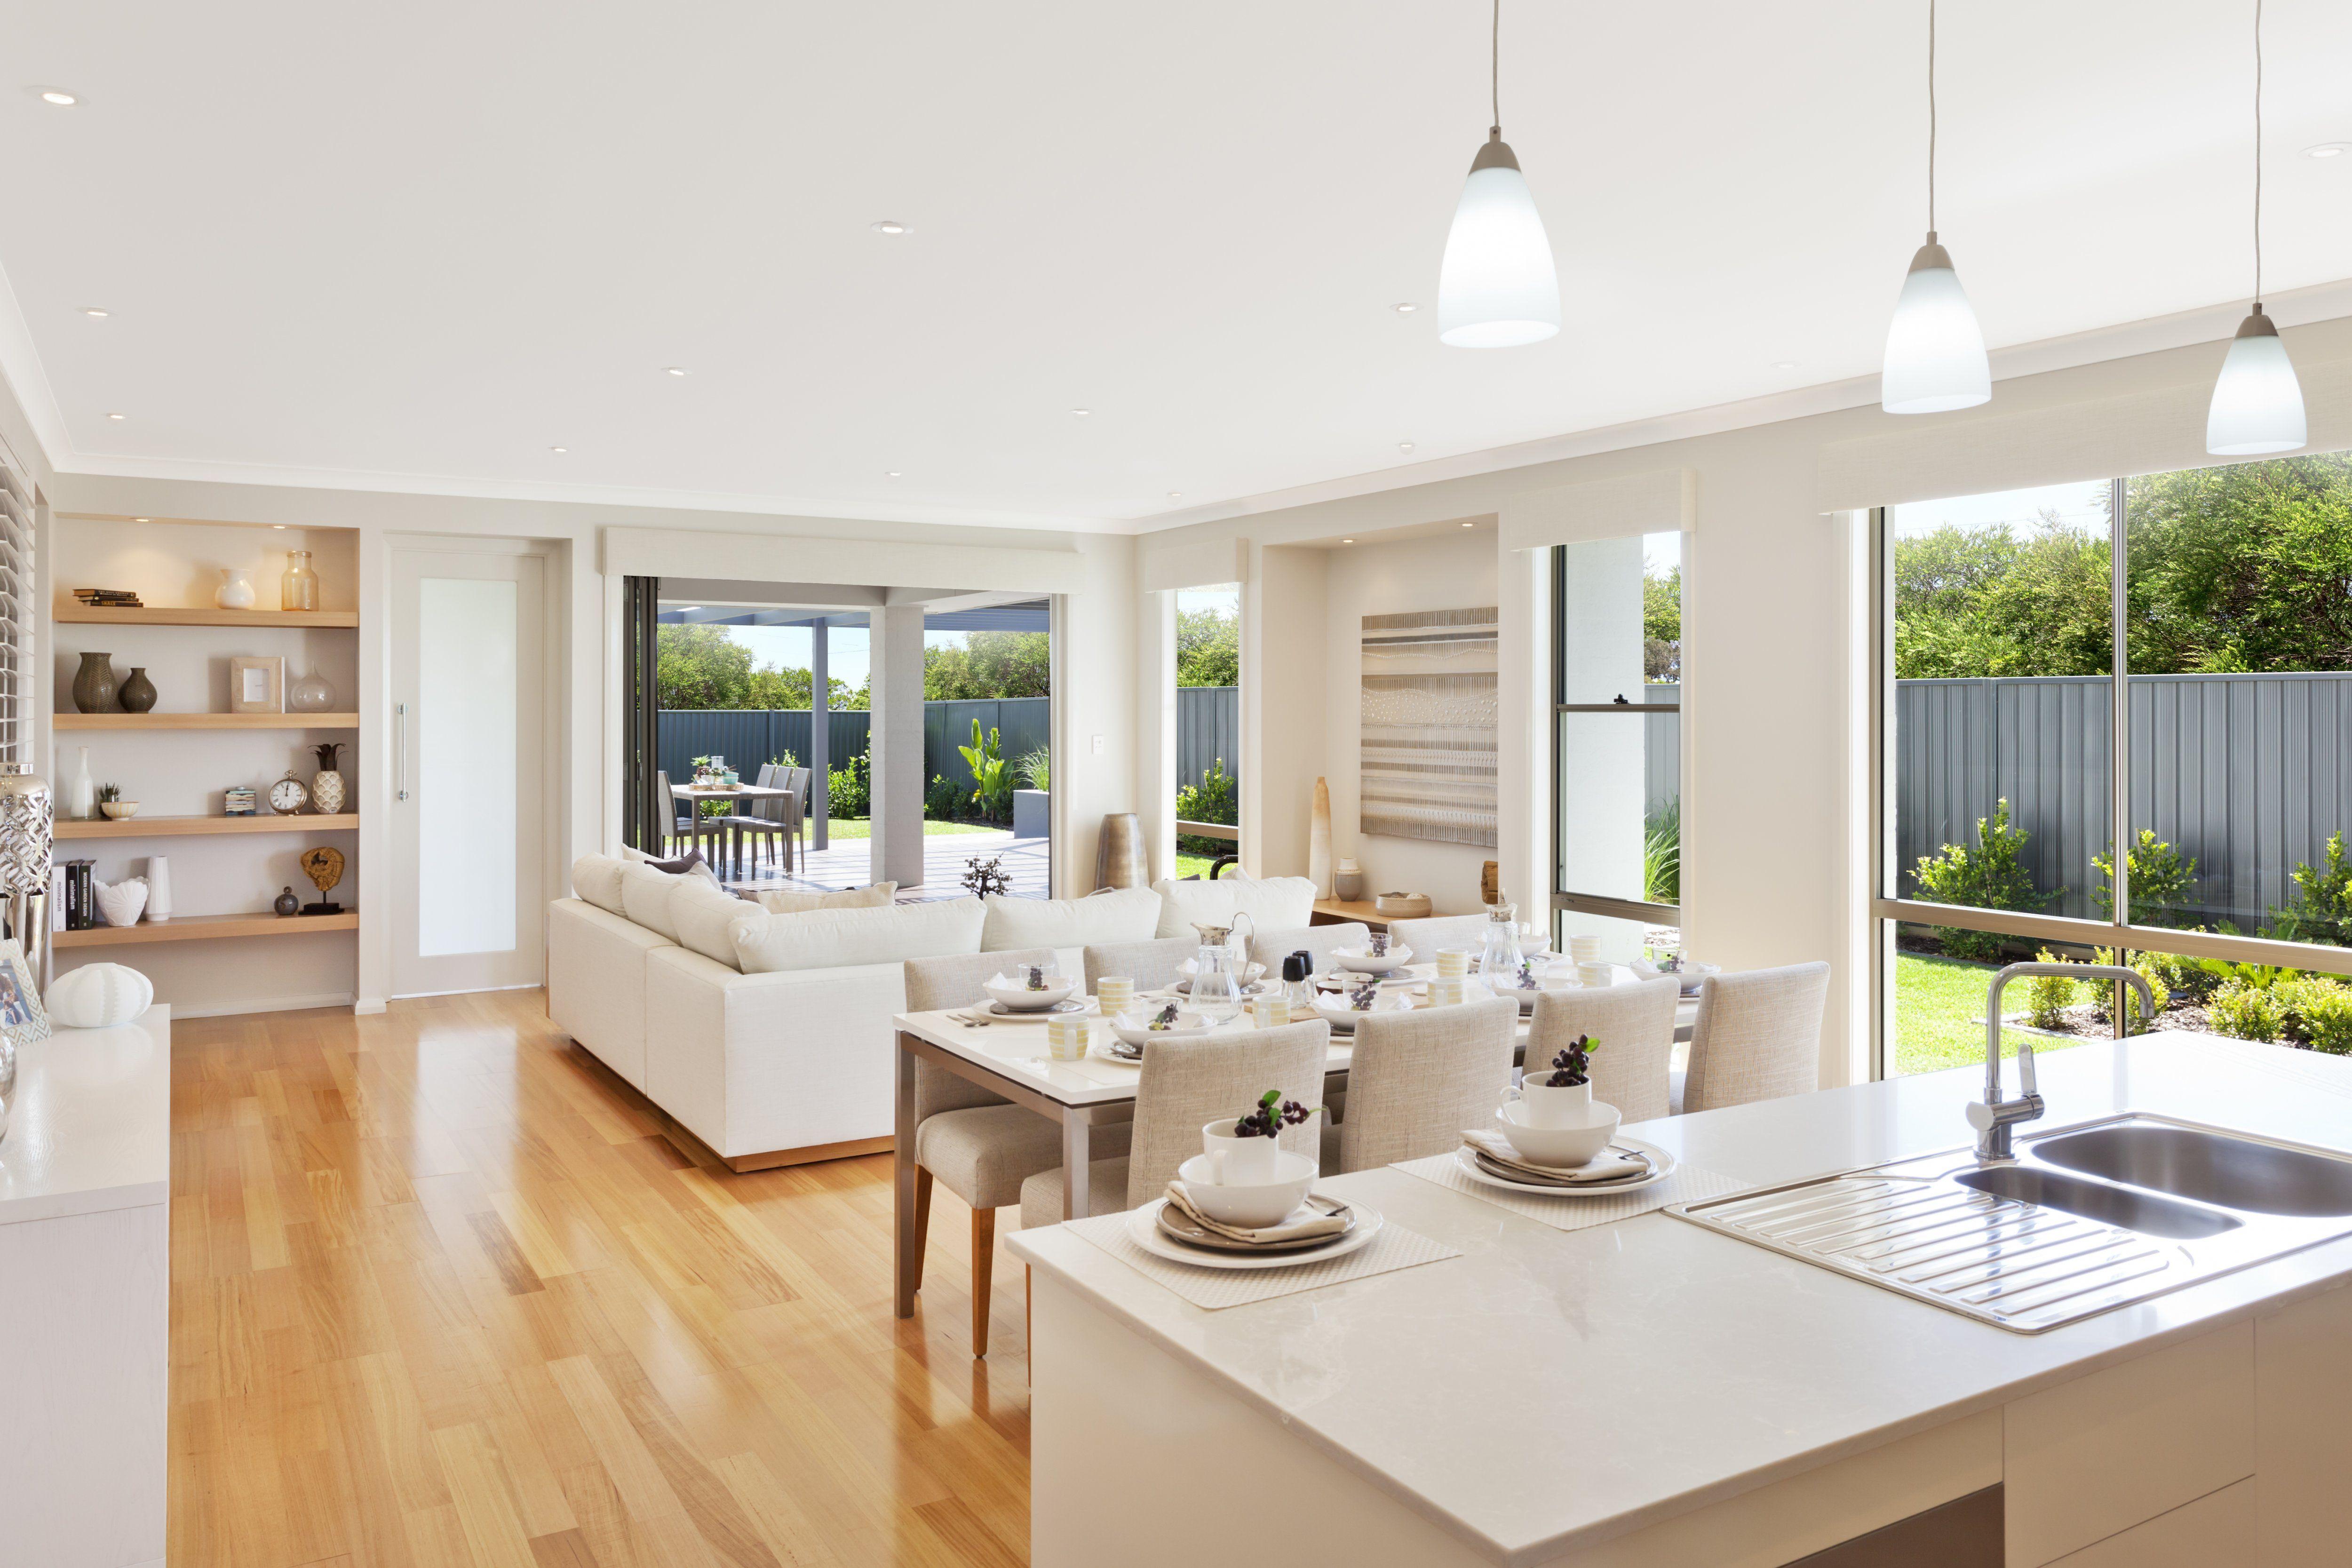 Building Buddy Plans - Abbott Builders - emailed | salon | Pinterest ...